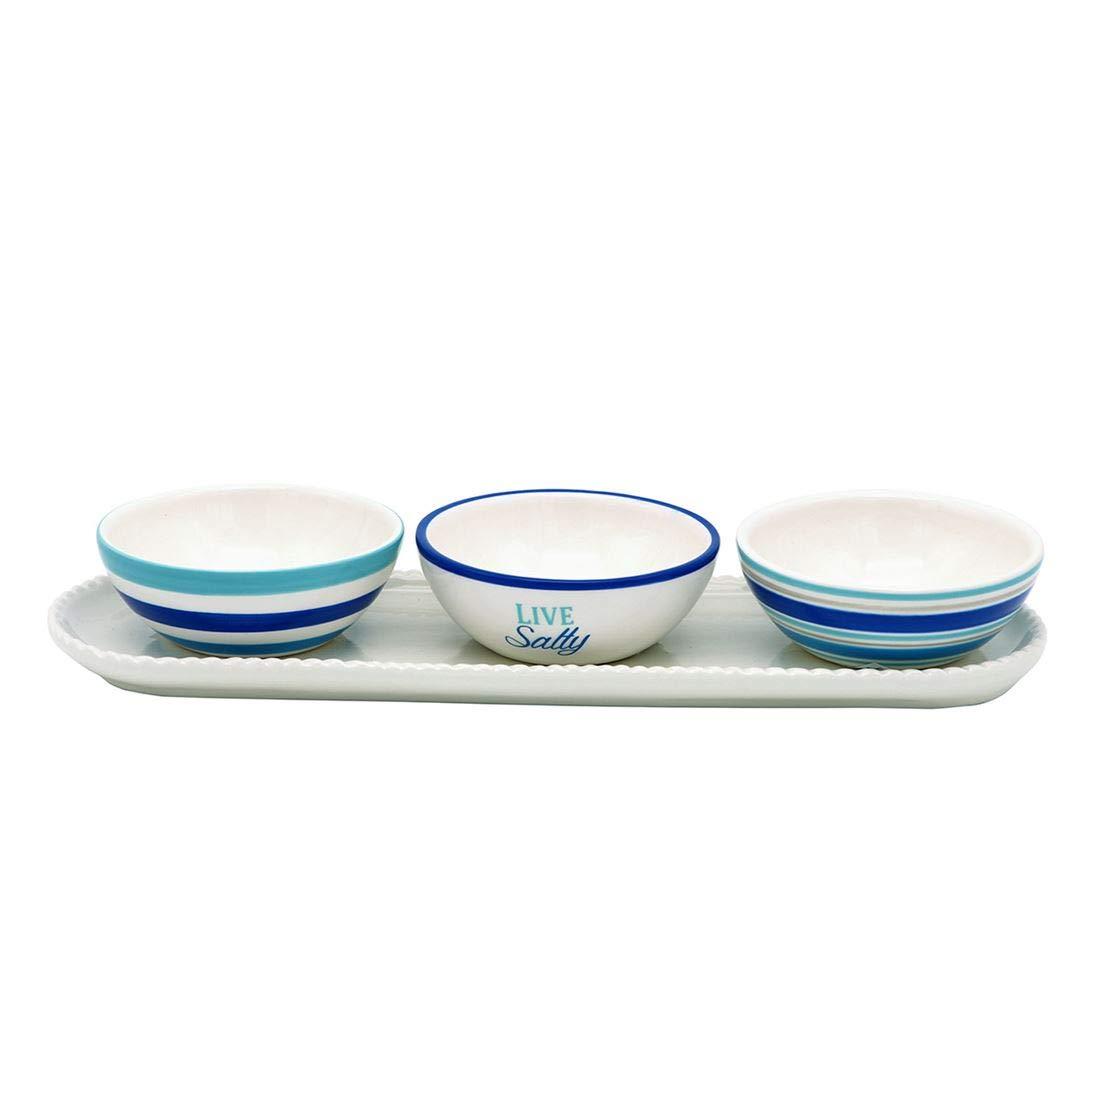 DEI 11586 Condiment Bowls, 14.5 x 5.25 x 4.25, Blue/White